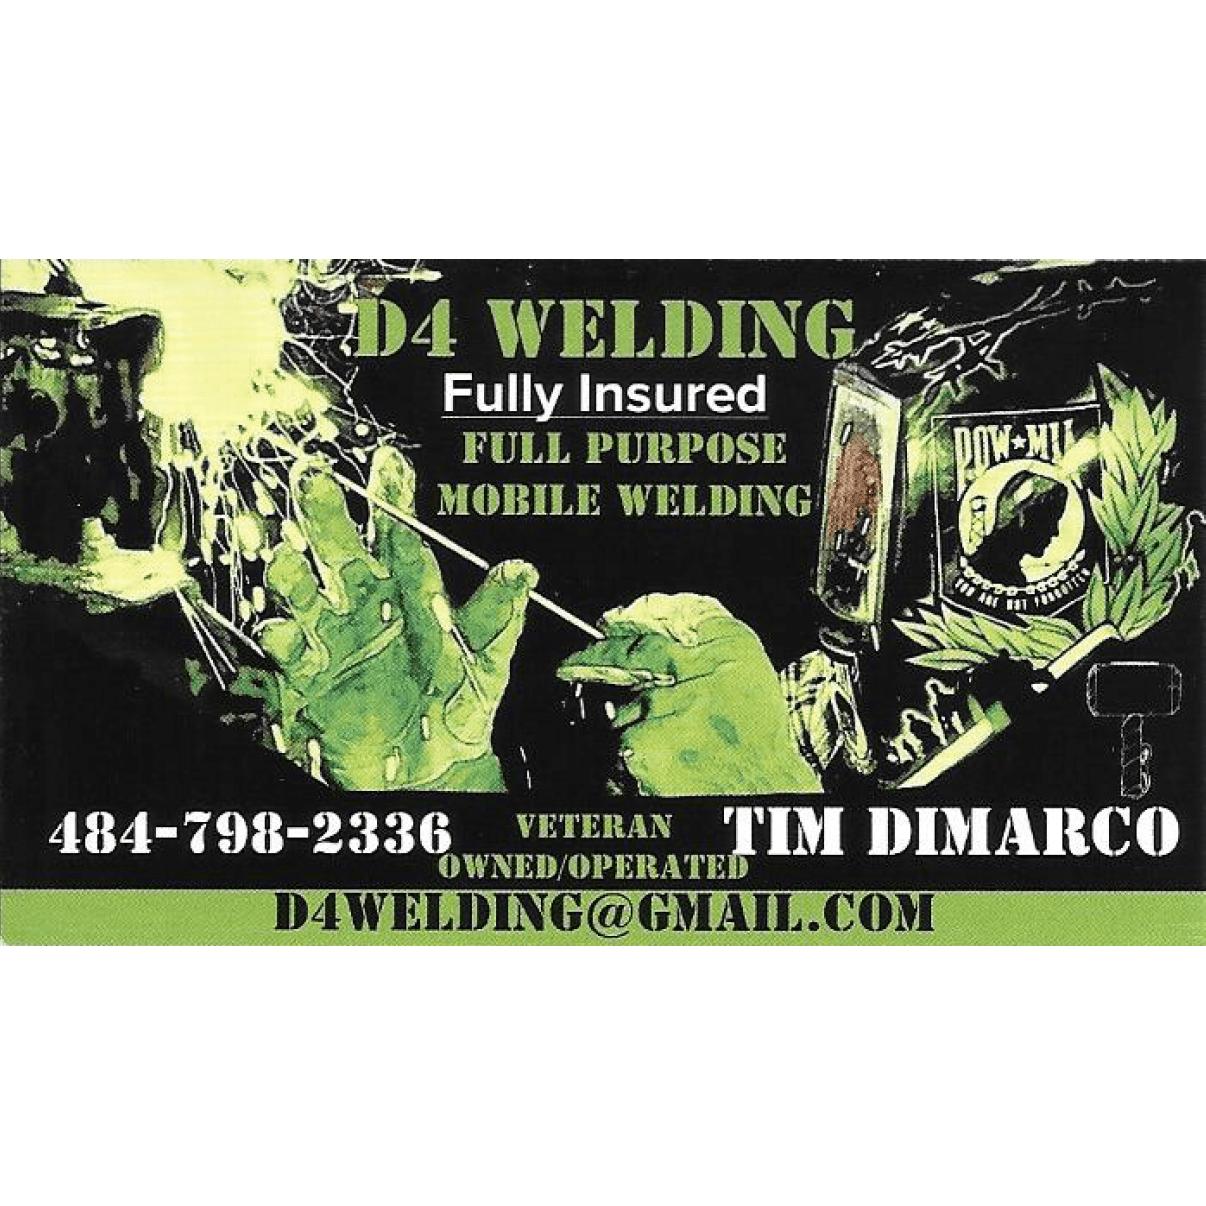 D4 Welding - Parkesburg, PA - Metal Welding